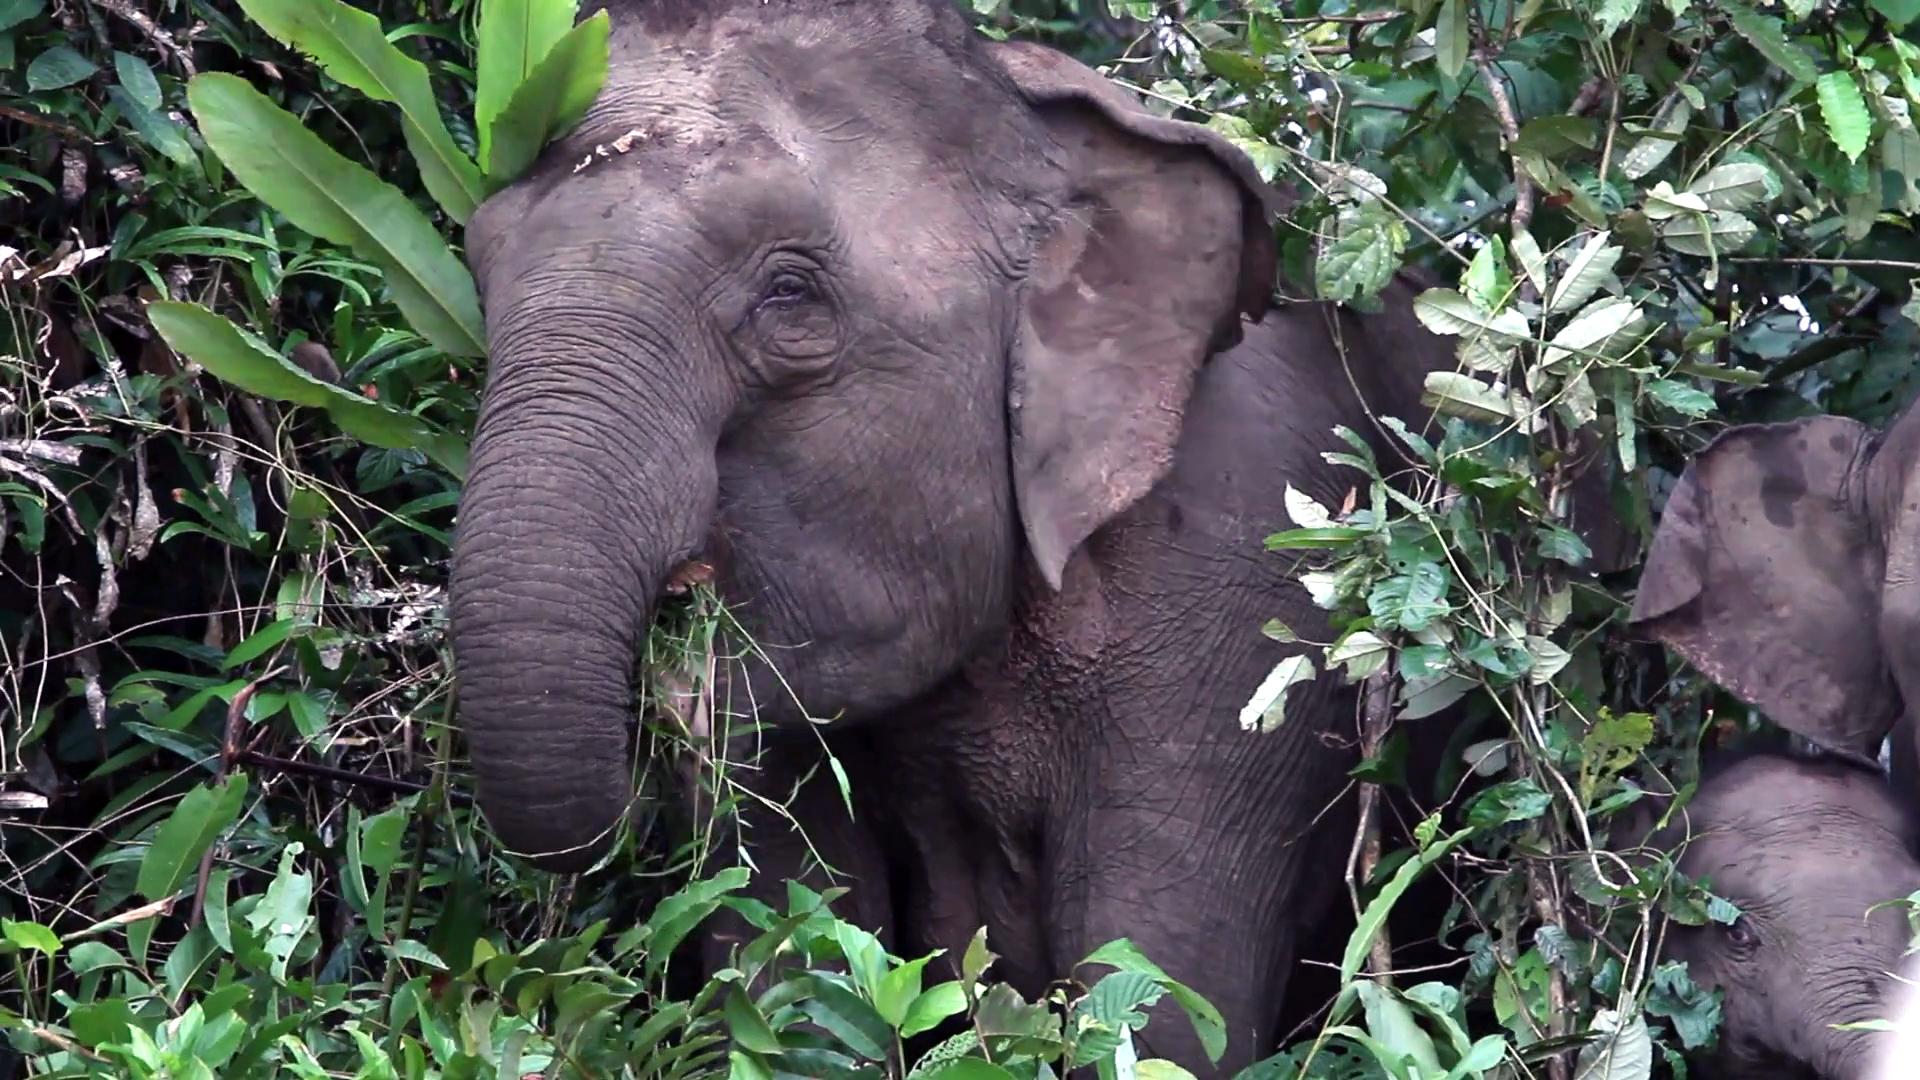 borneo-pygmy-elephant-in-the-bornean-rainforest_bcm17ahjx_thumbnail-full01 copy.jpg